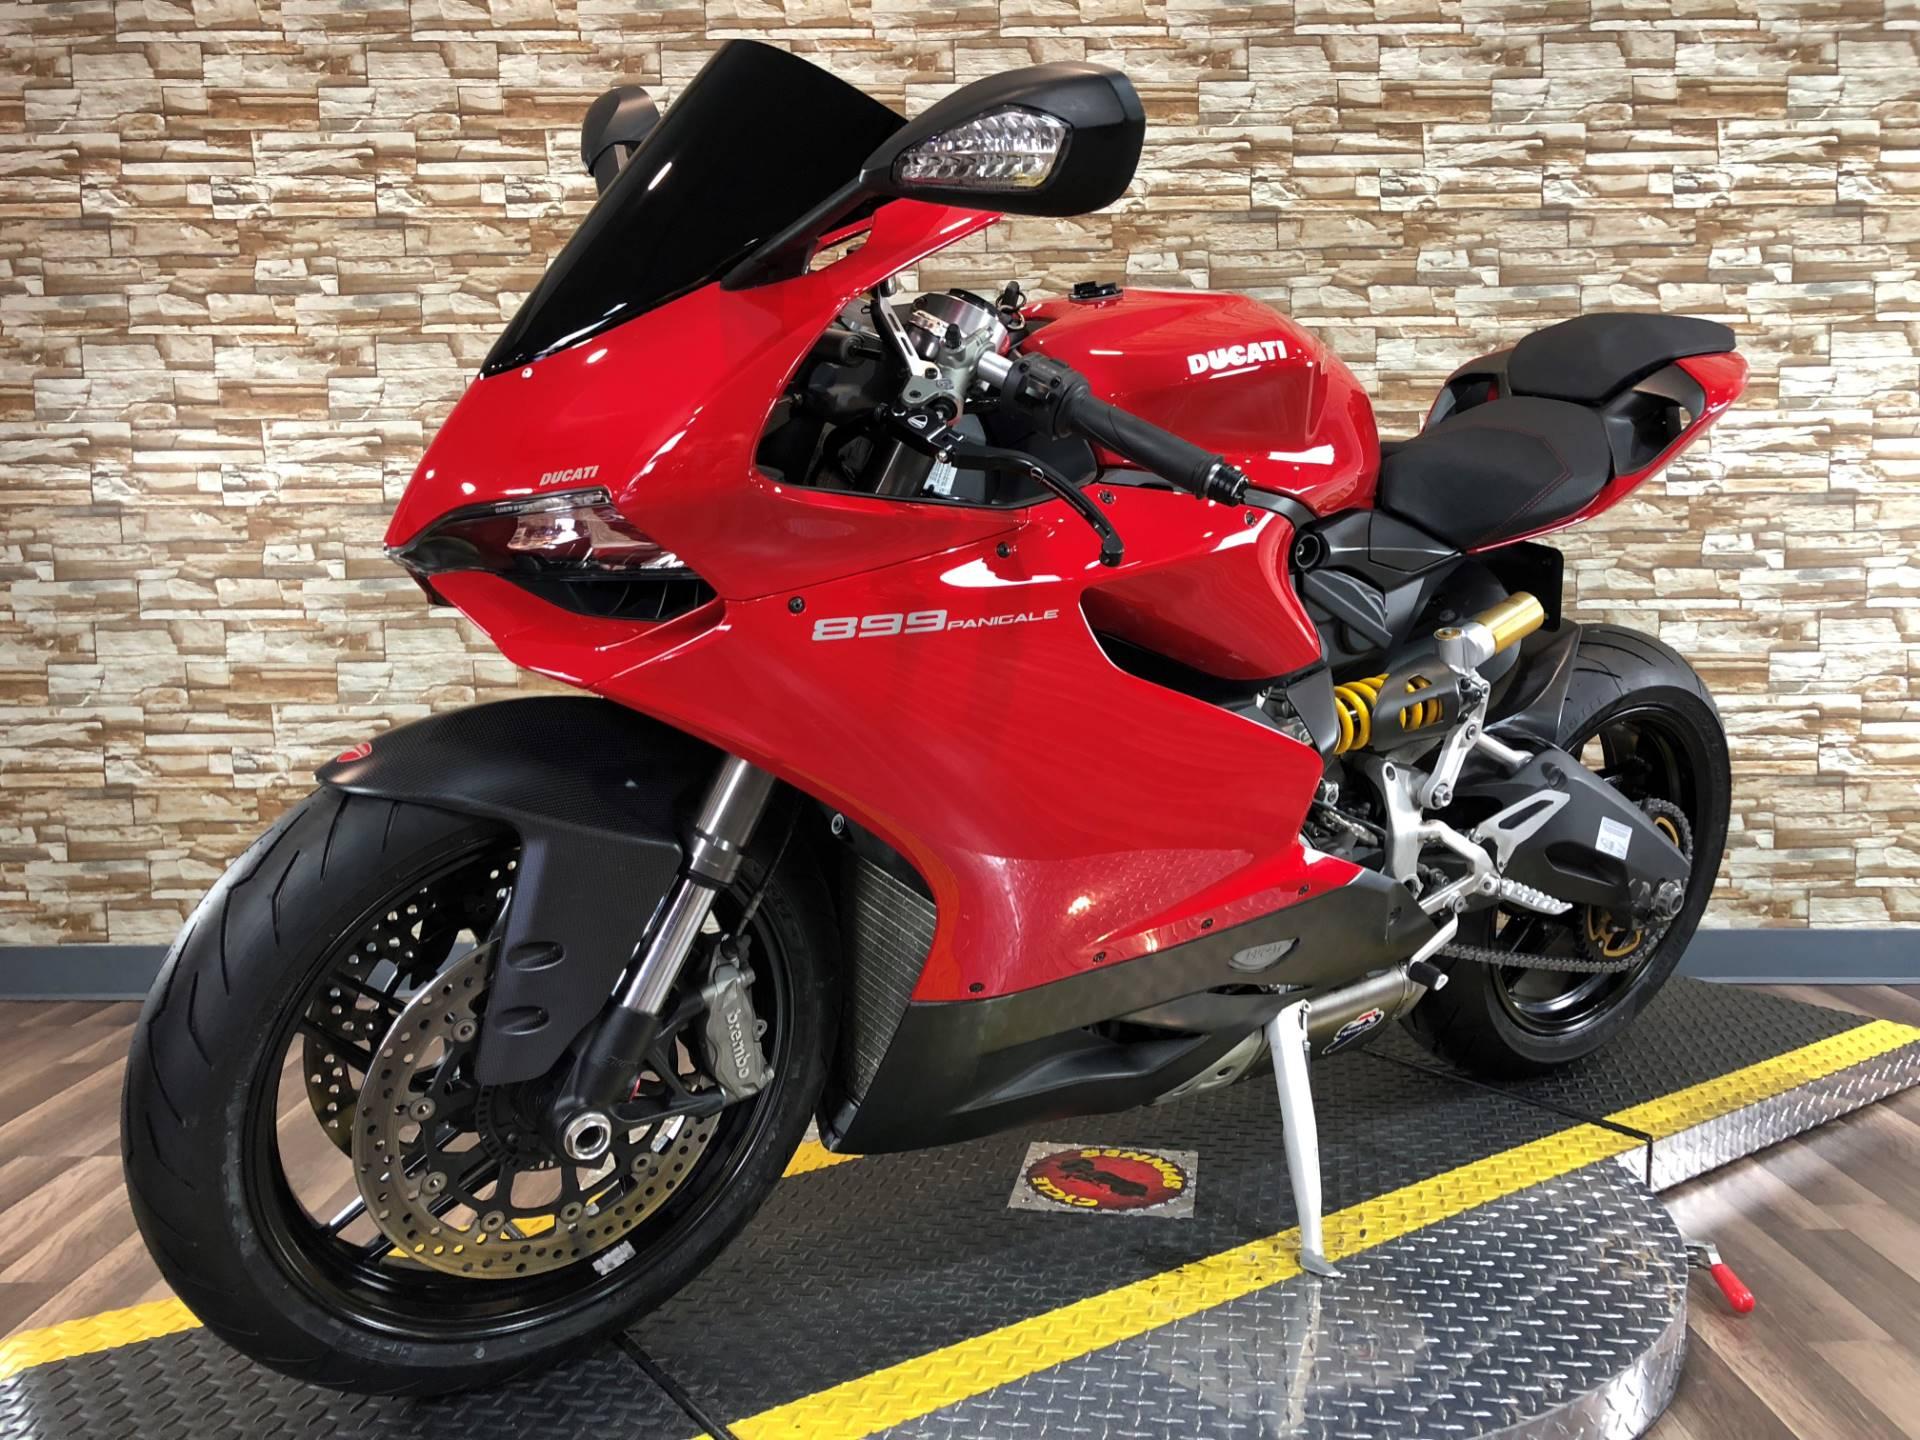 2014 Ducati Superbike 899 Panigale 6